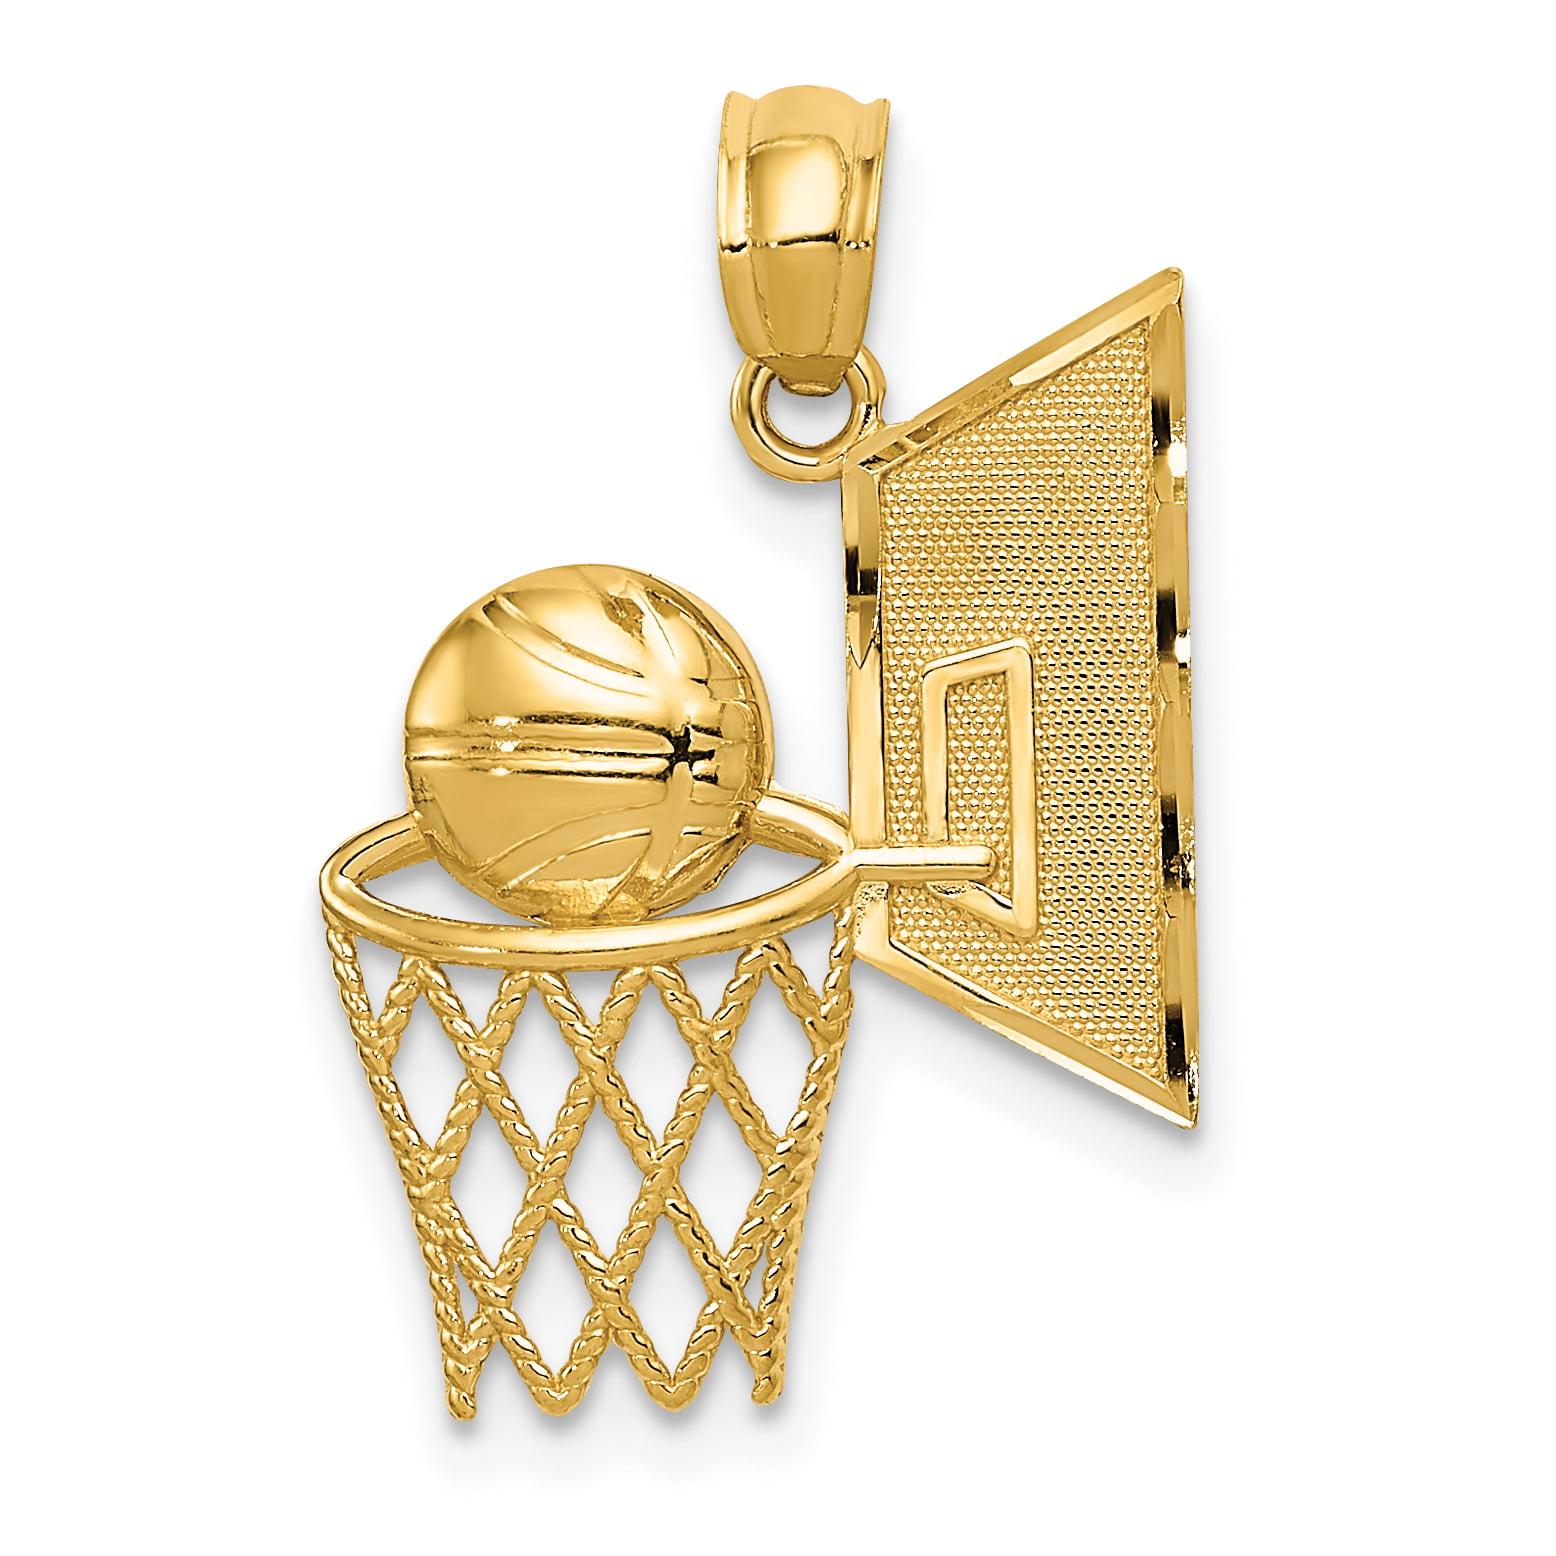 14k Yellow Gold Basketball Pendant Charm Necklace Sport Fine ... 223ae4b48f